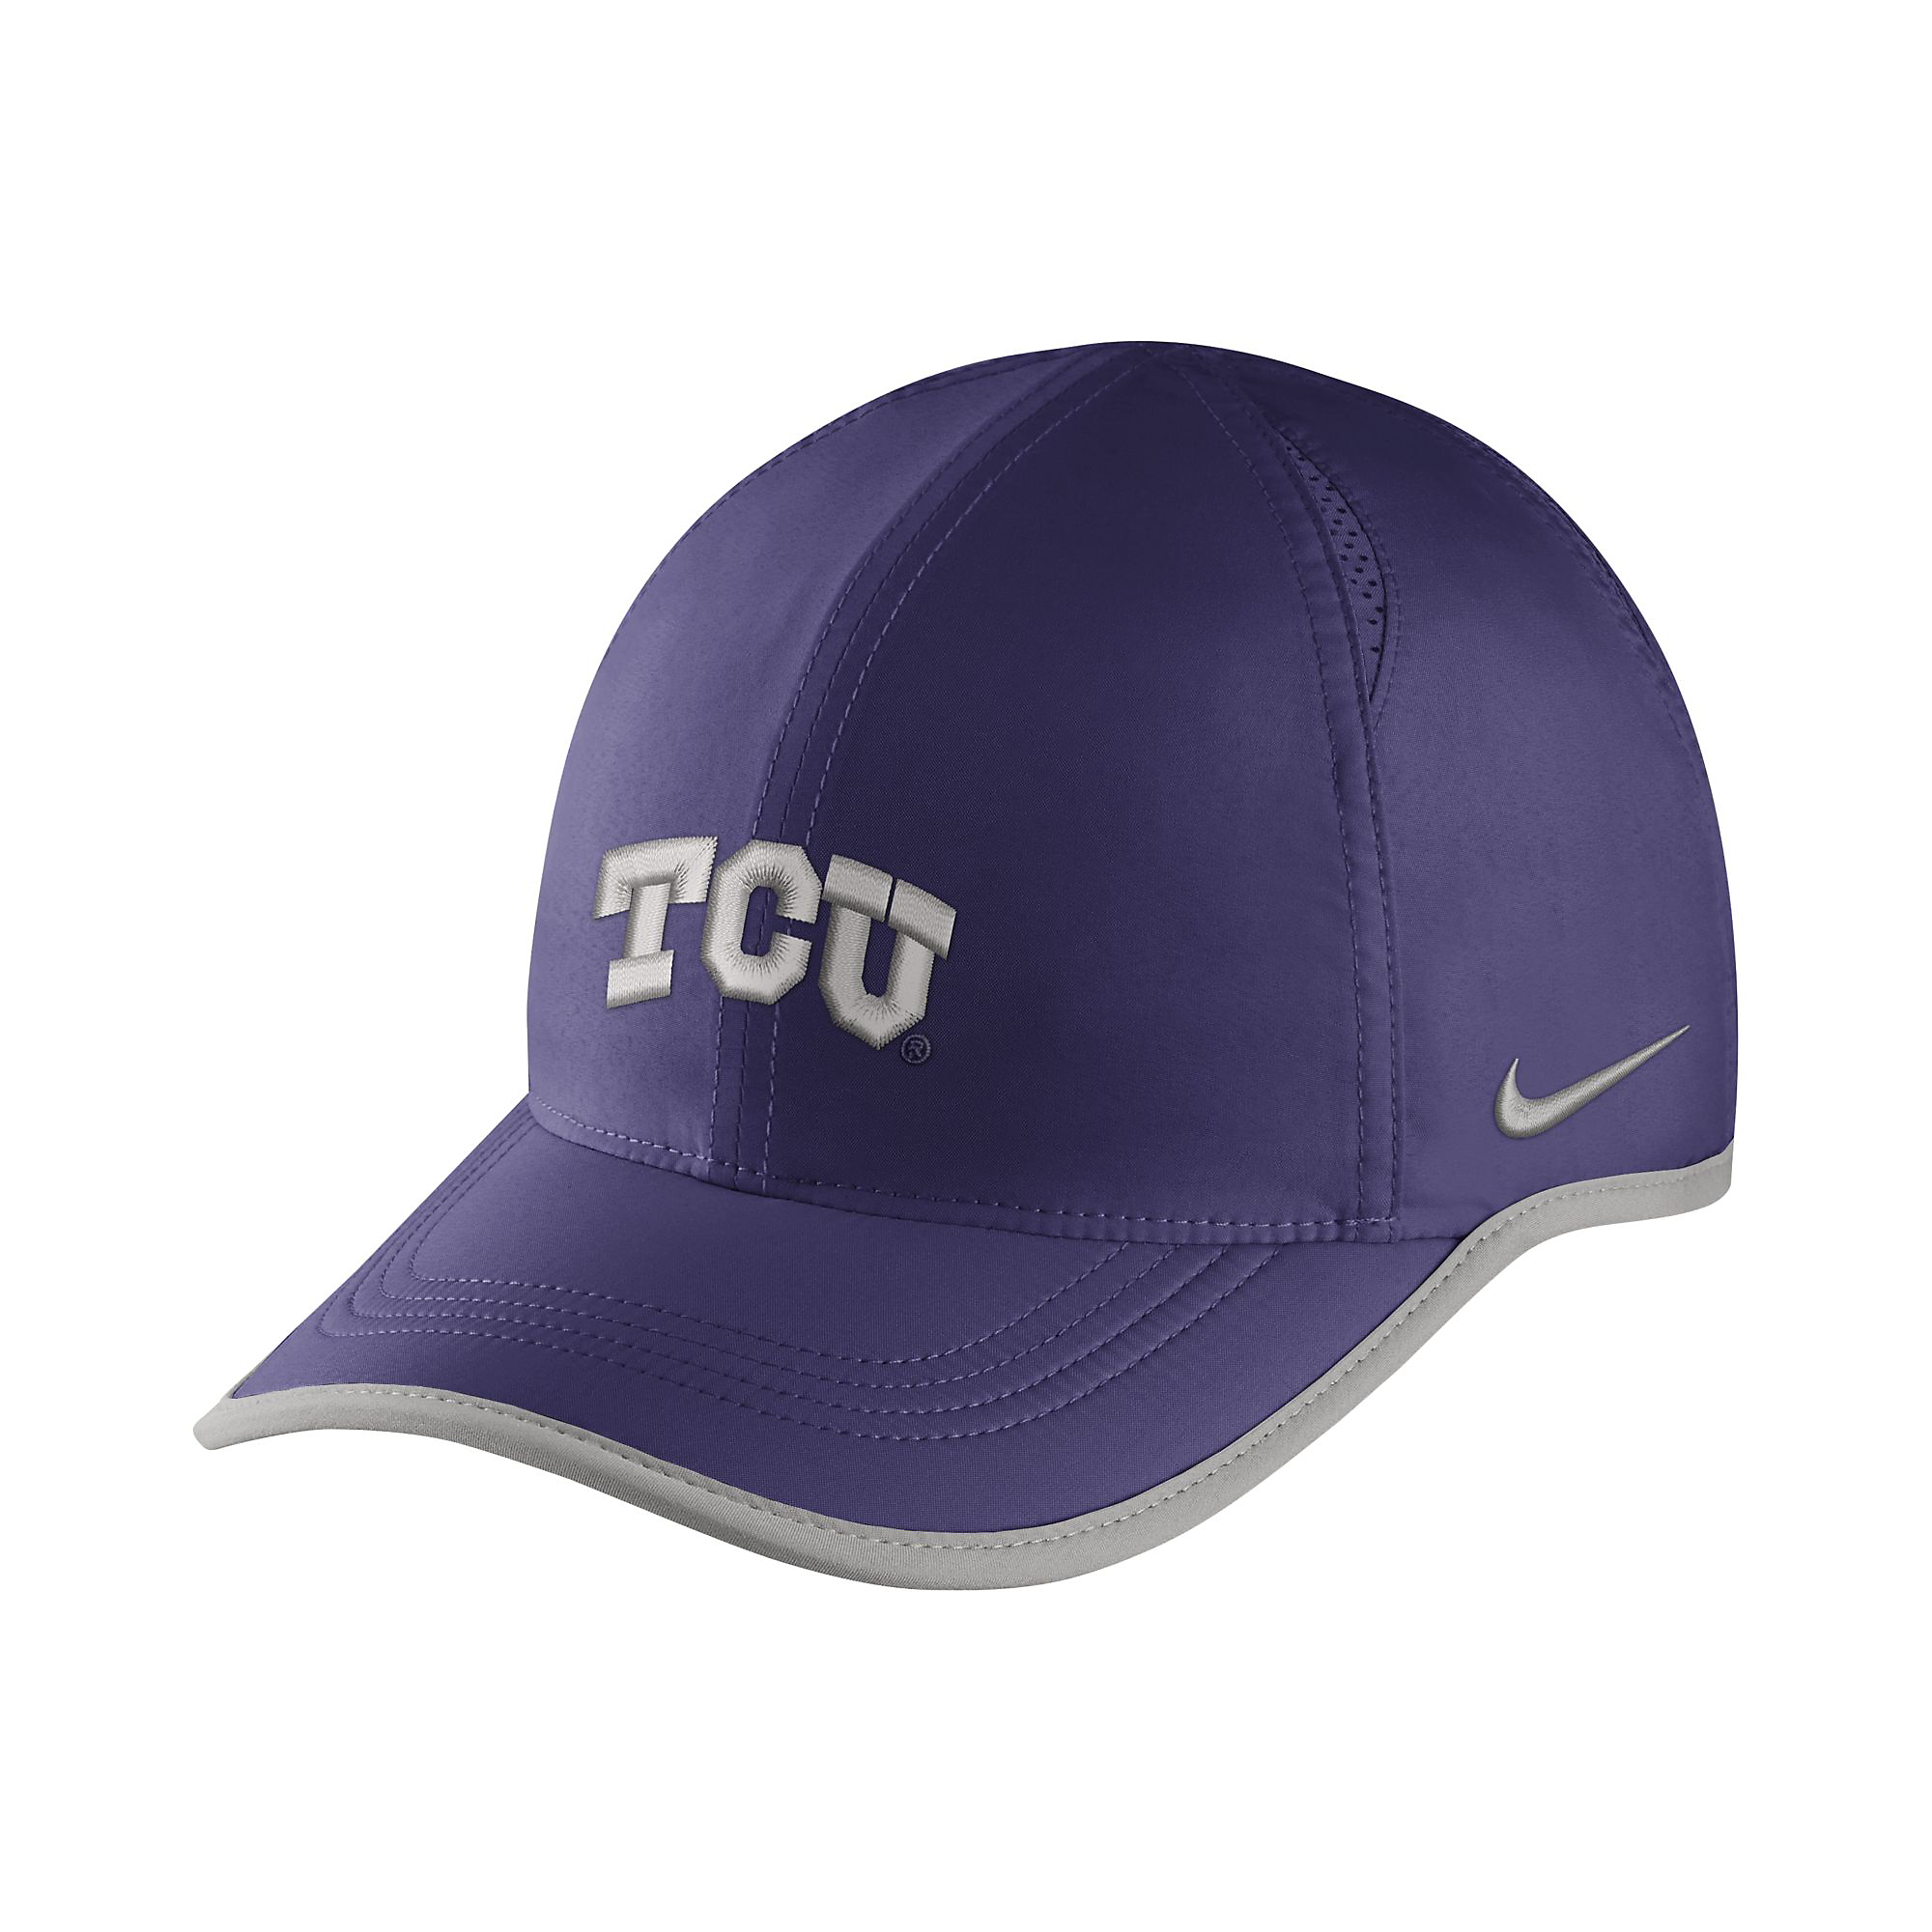 TCU Horned Frogs Nike Featherlight Aerobill Cap